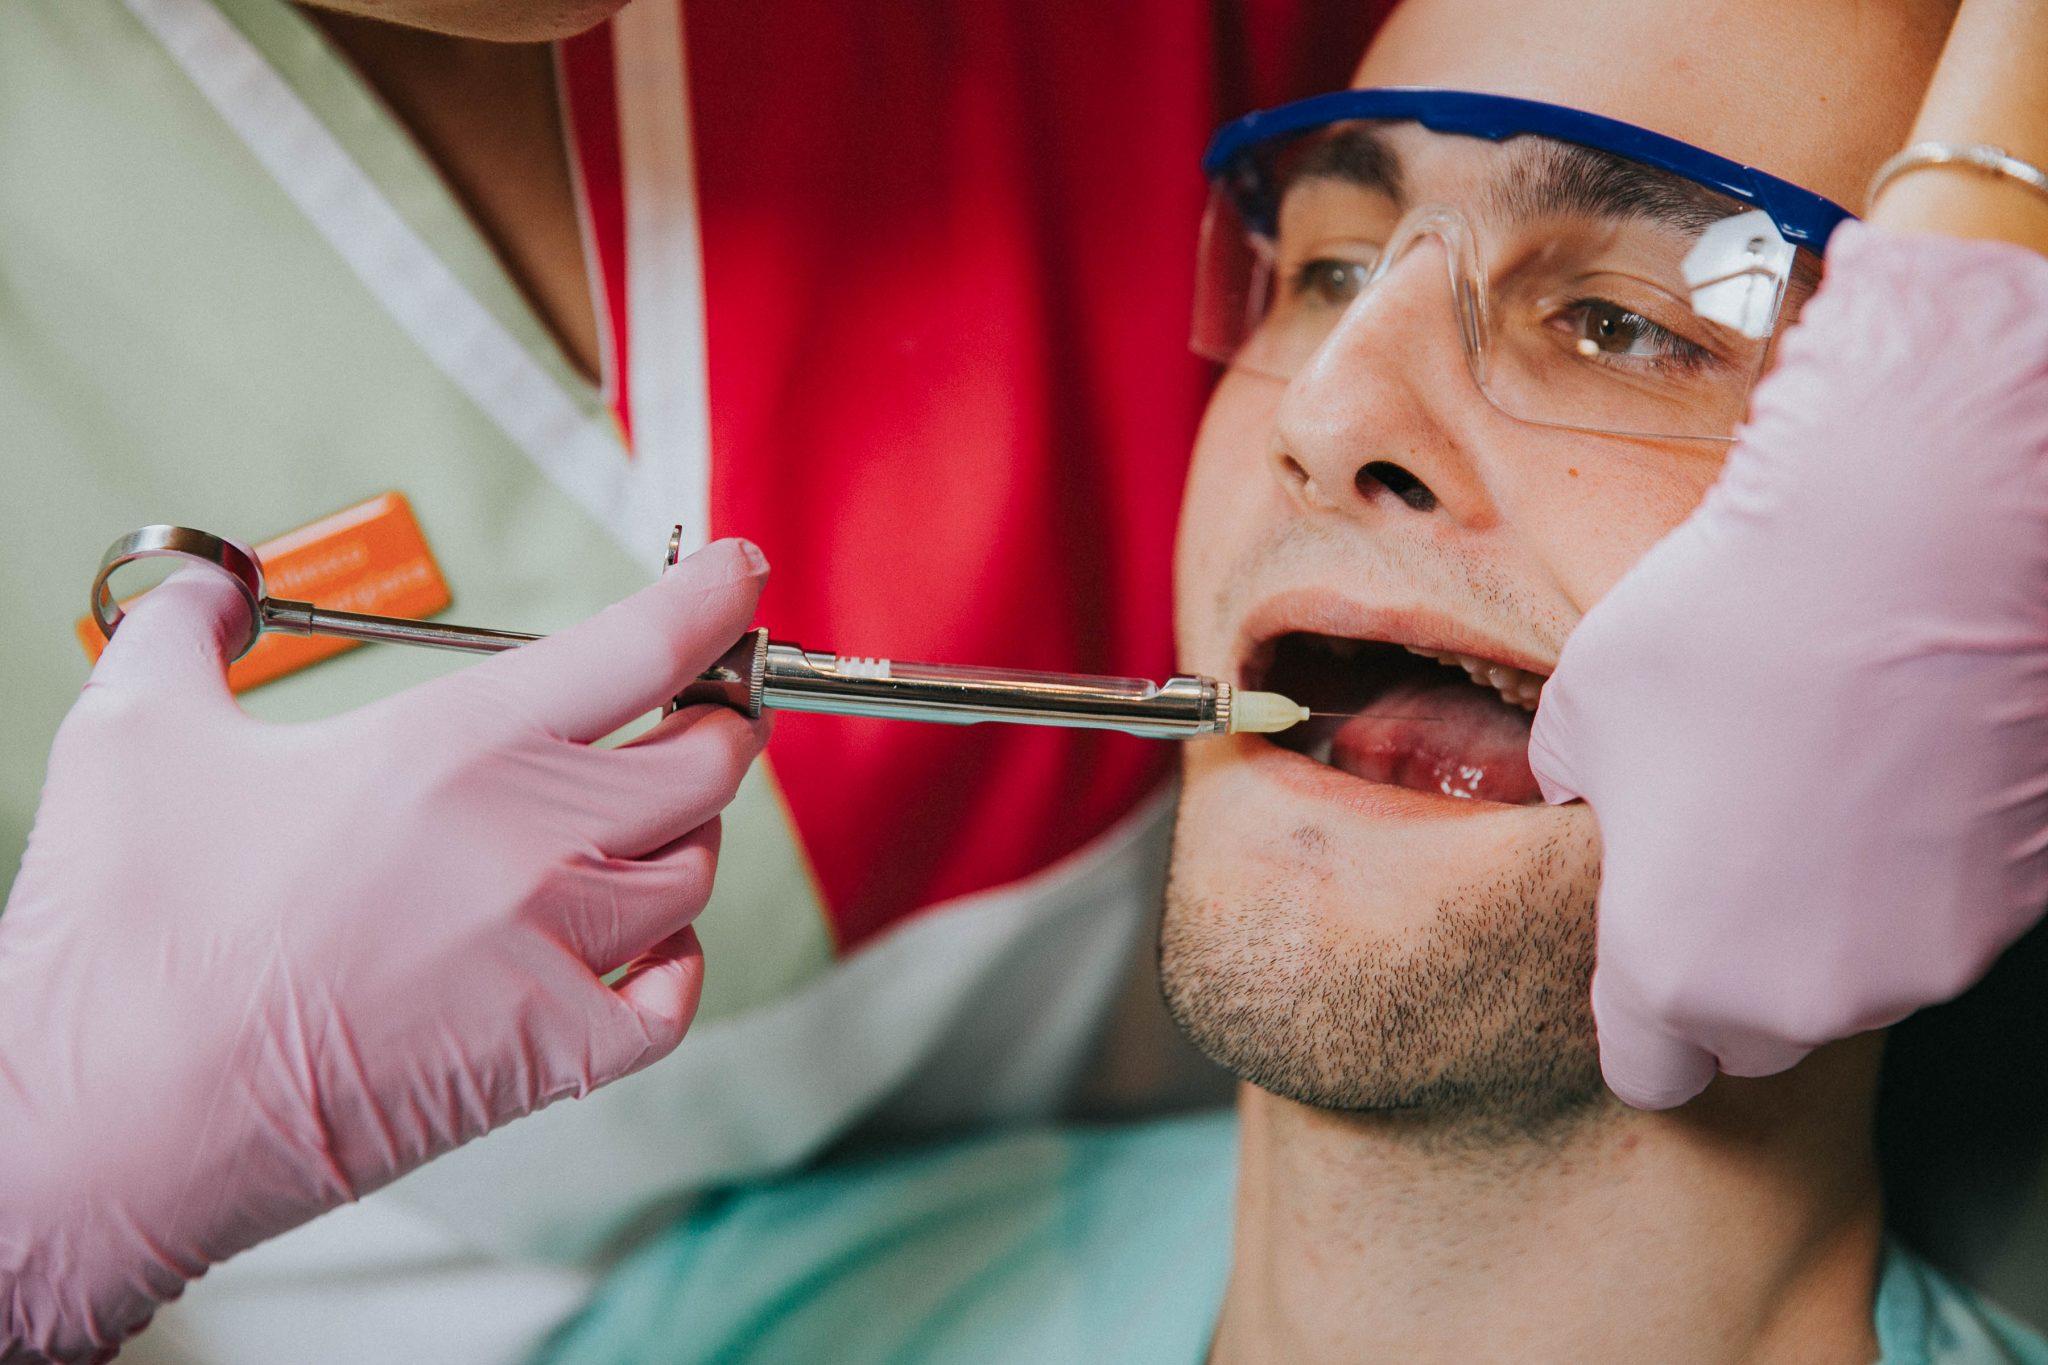 facultatea de stamatologie targu mures UMF absolvenit stamatolog medic doctor fotografie comerciala fotograf profesionist majos daniel_-24